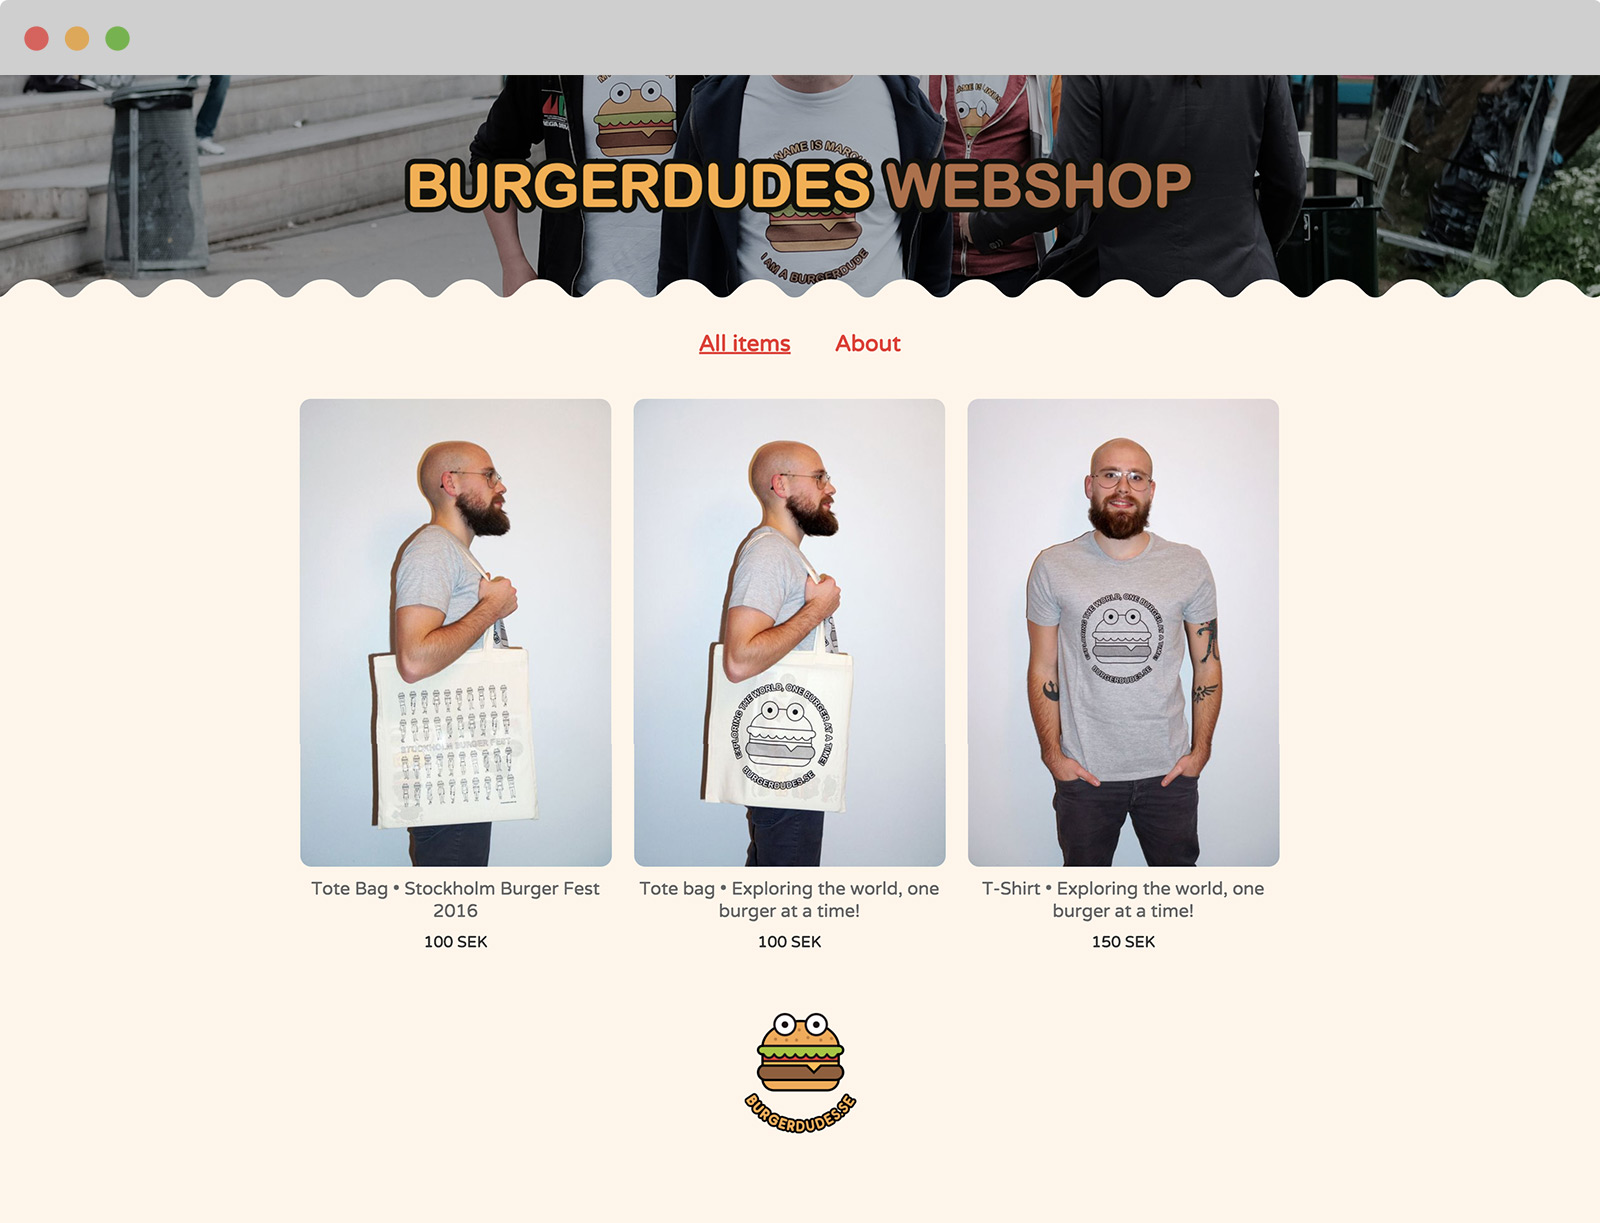 burgerdudes-webshop